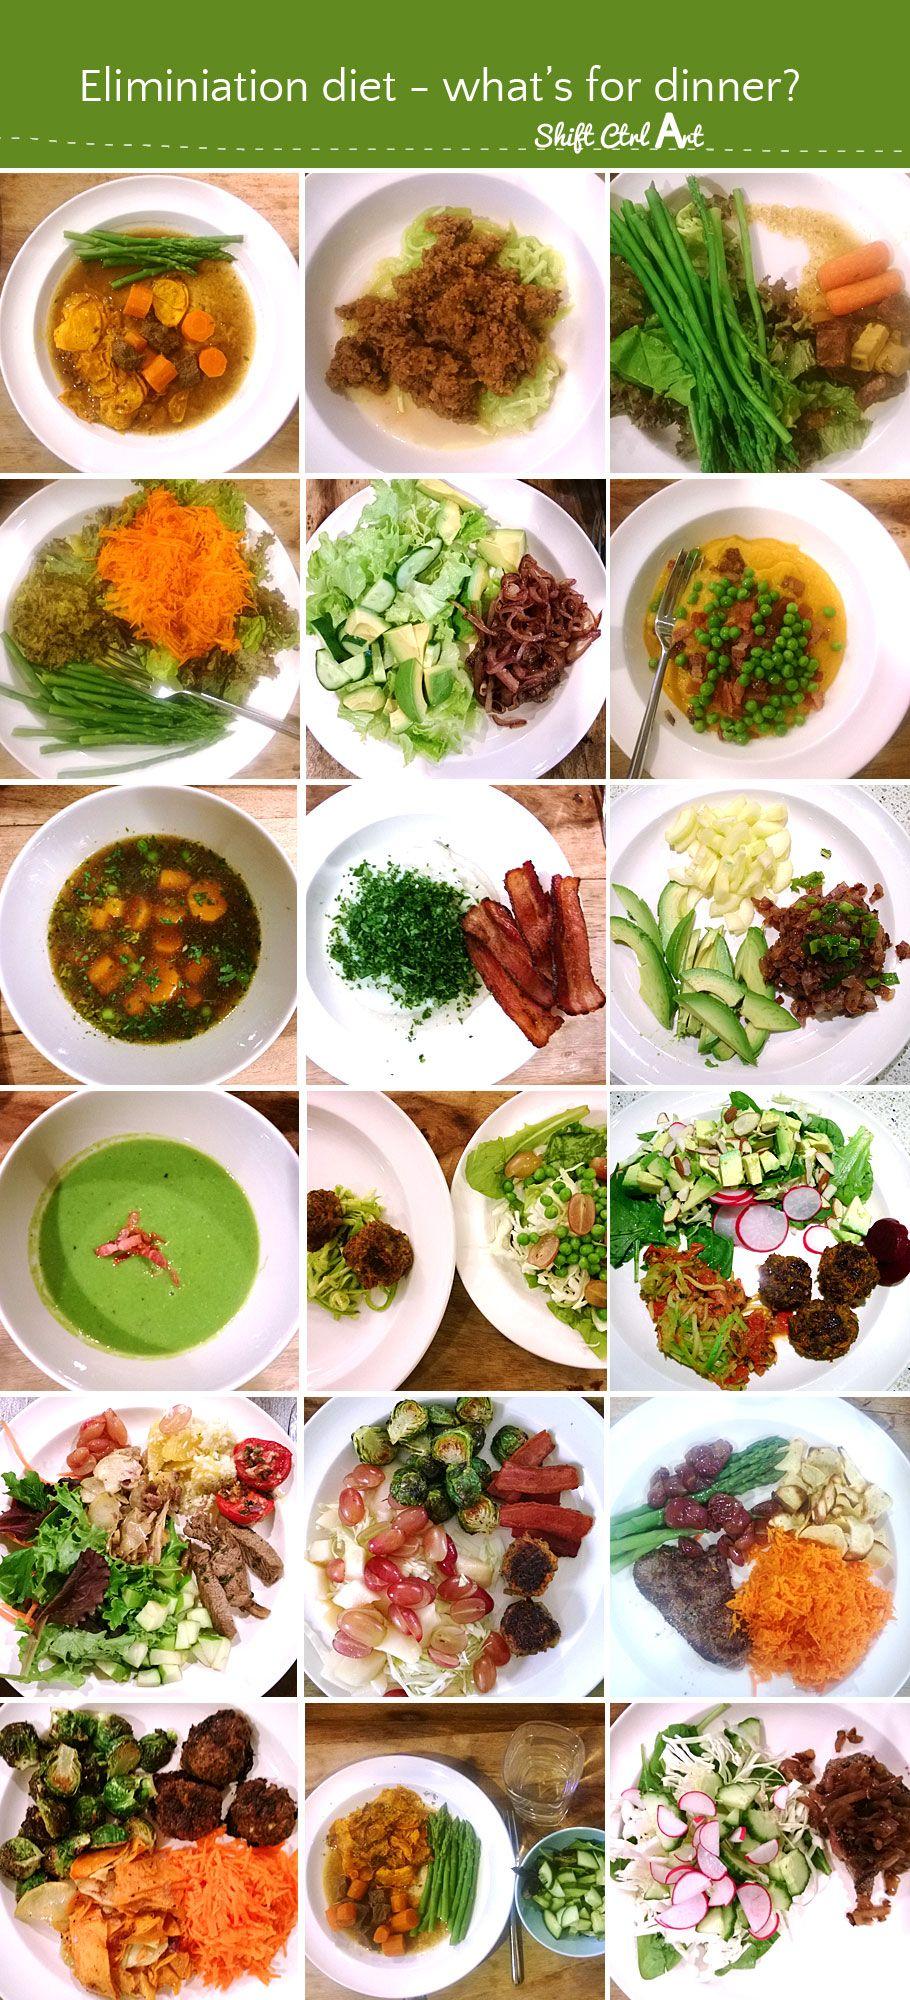 Elimination diet - what do I eat?  Elimination diet recipes